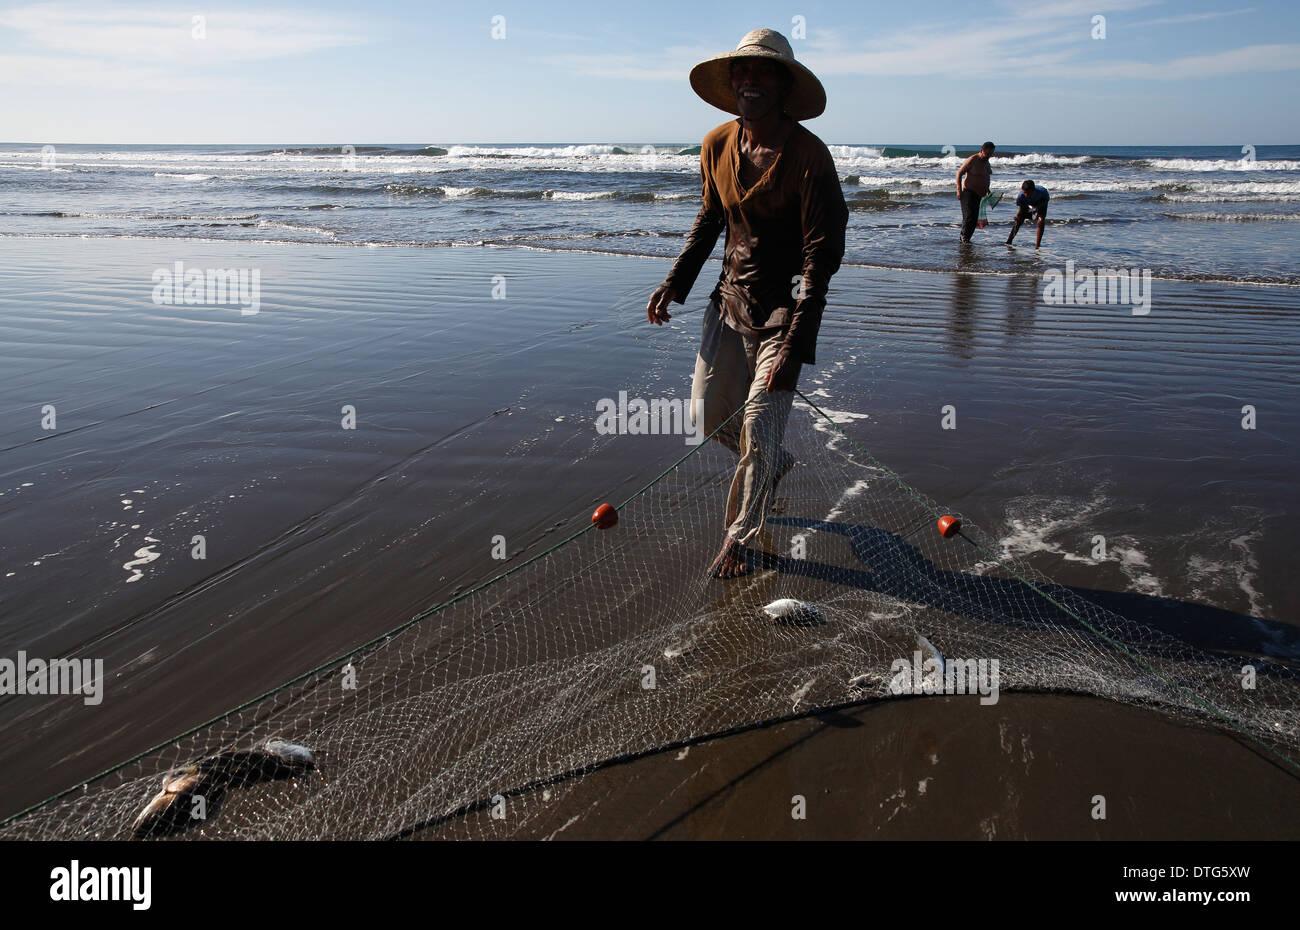 Fishermen on the Pacific coast beach at Mechapa, Nicaragua - Stock Image